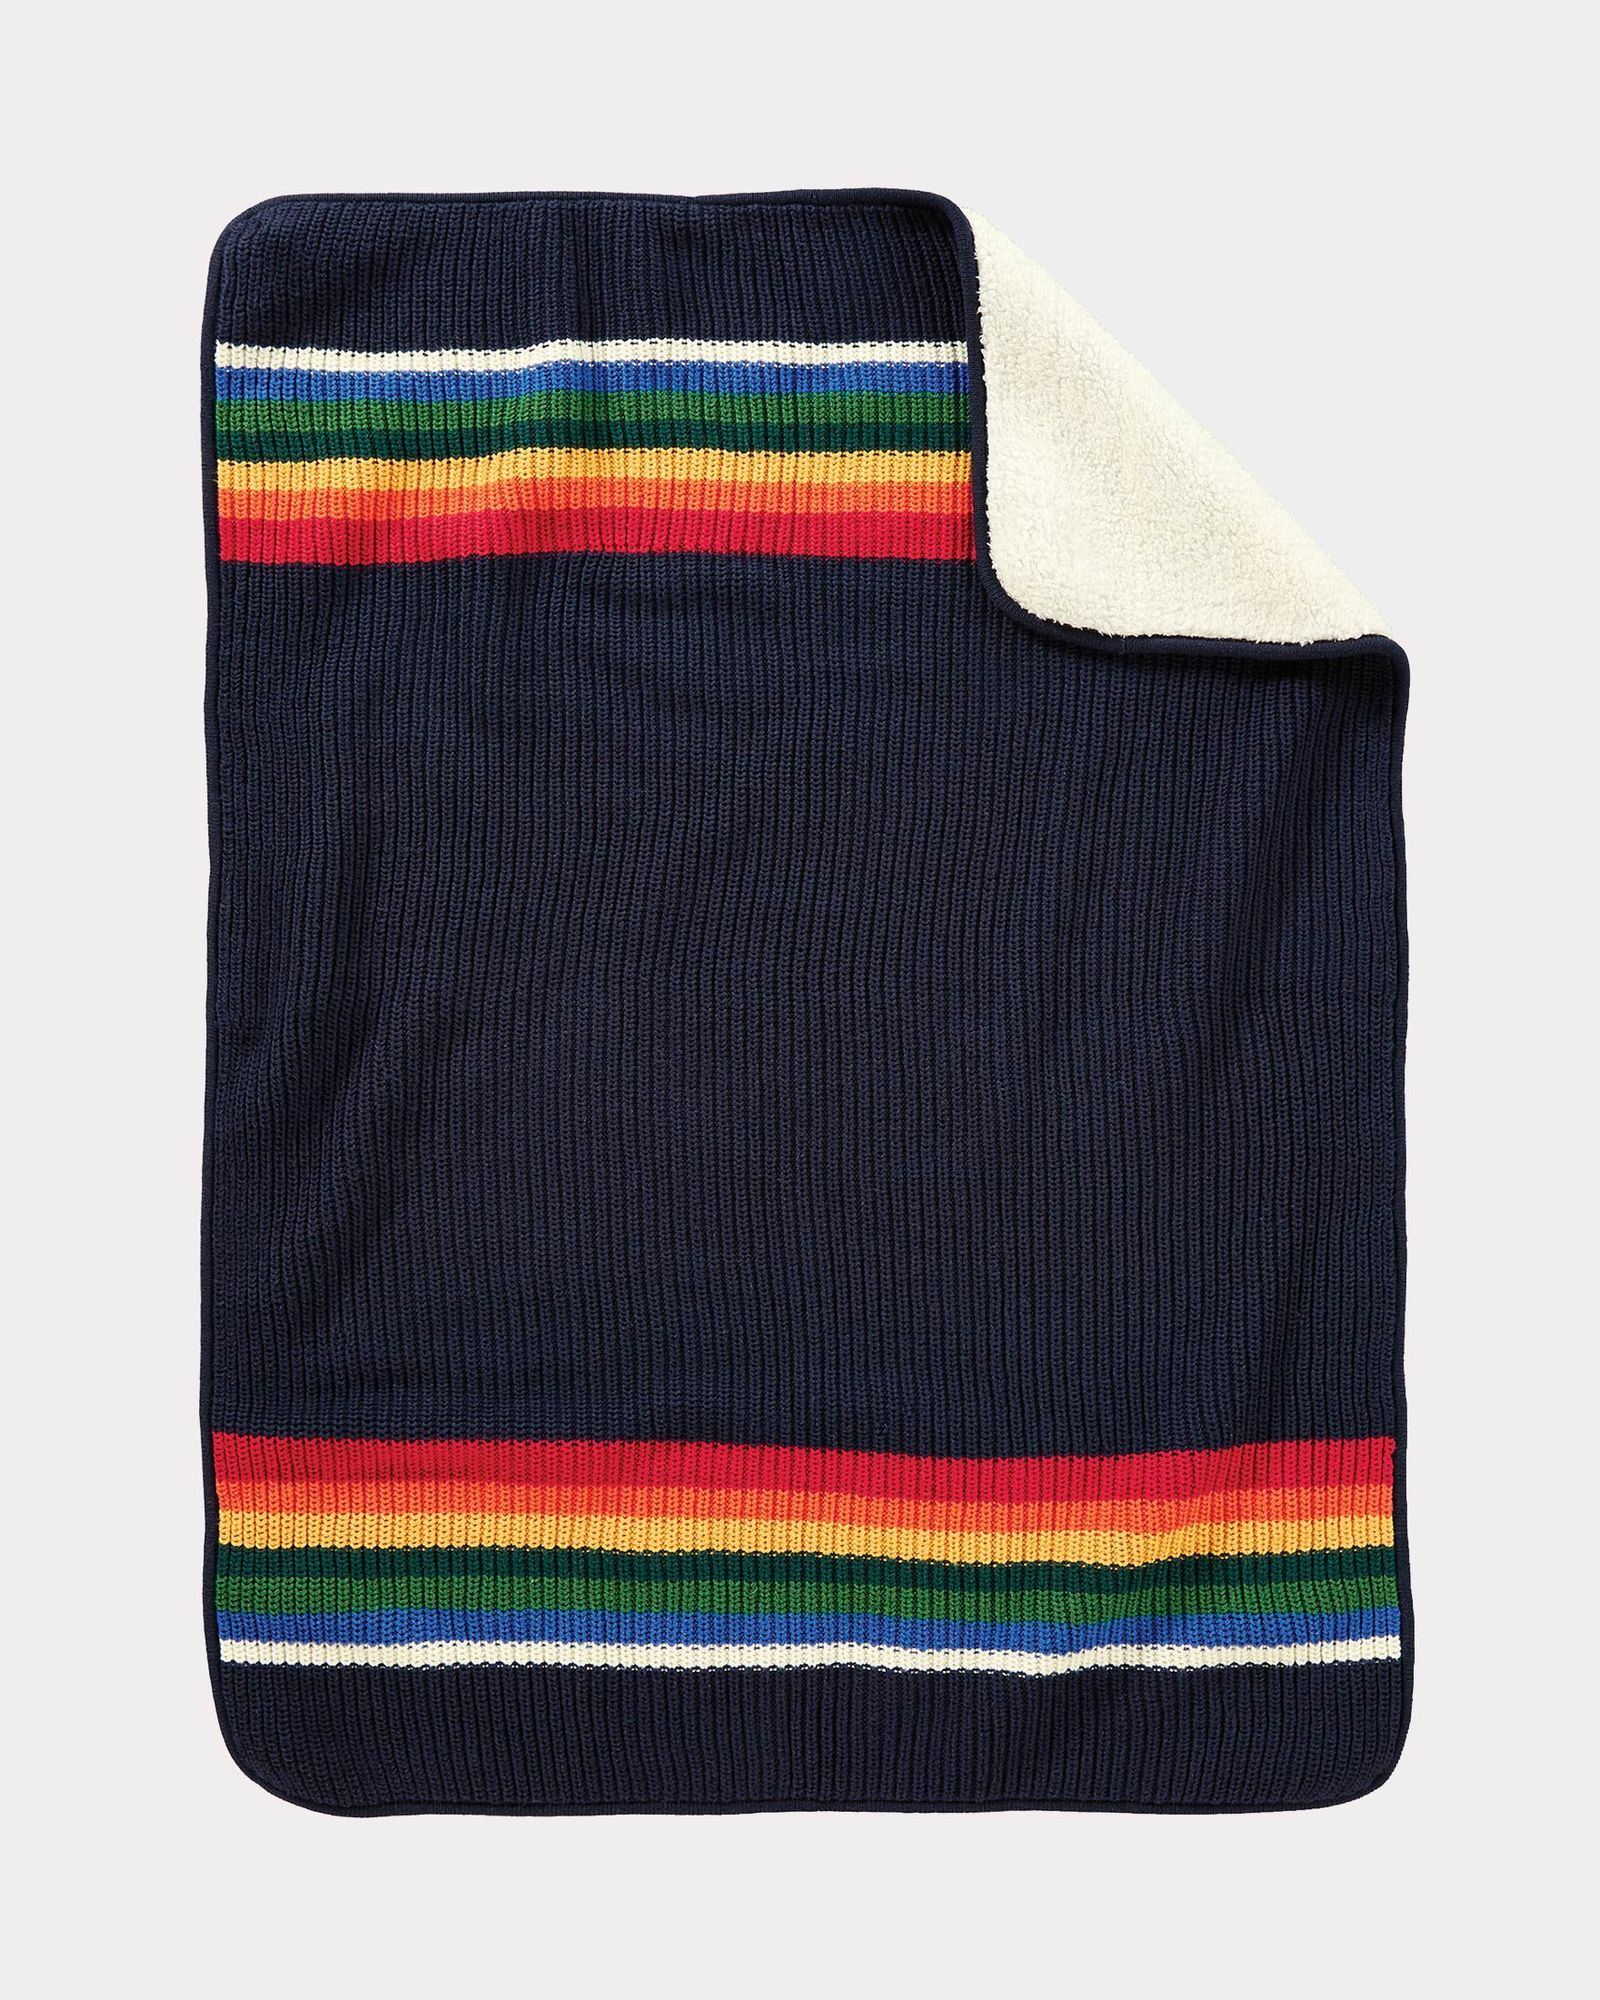 Love this color scheme Baby girl blankets, Stroller